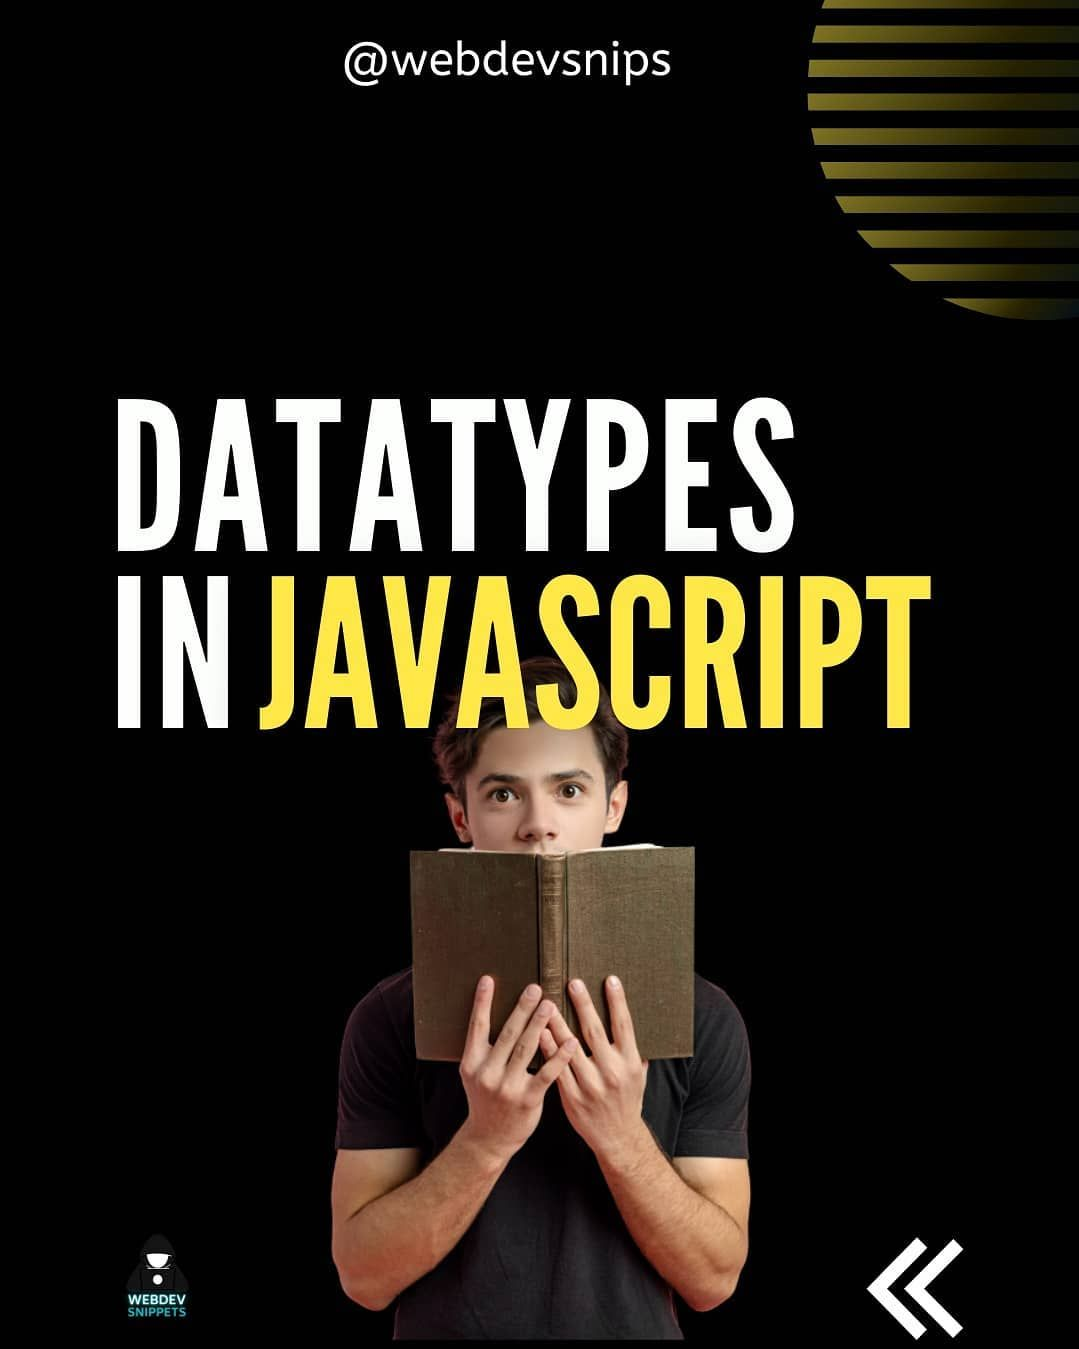 Datatypes in javascript